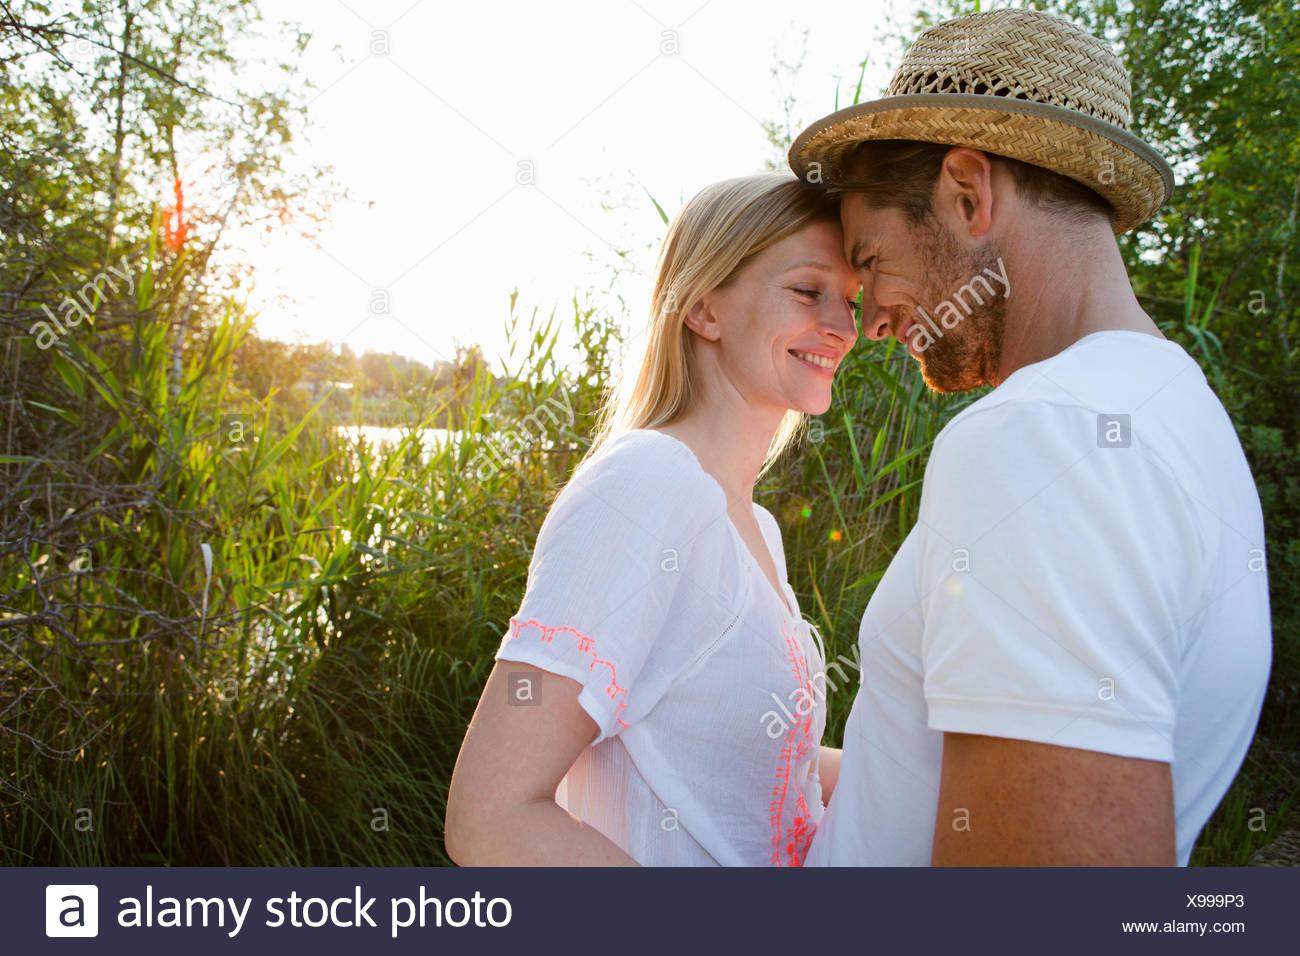 Adult couple pic romance